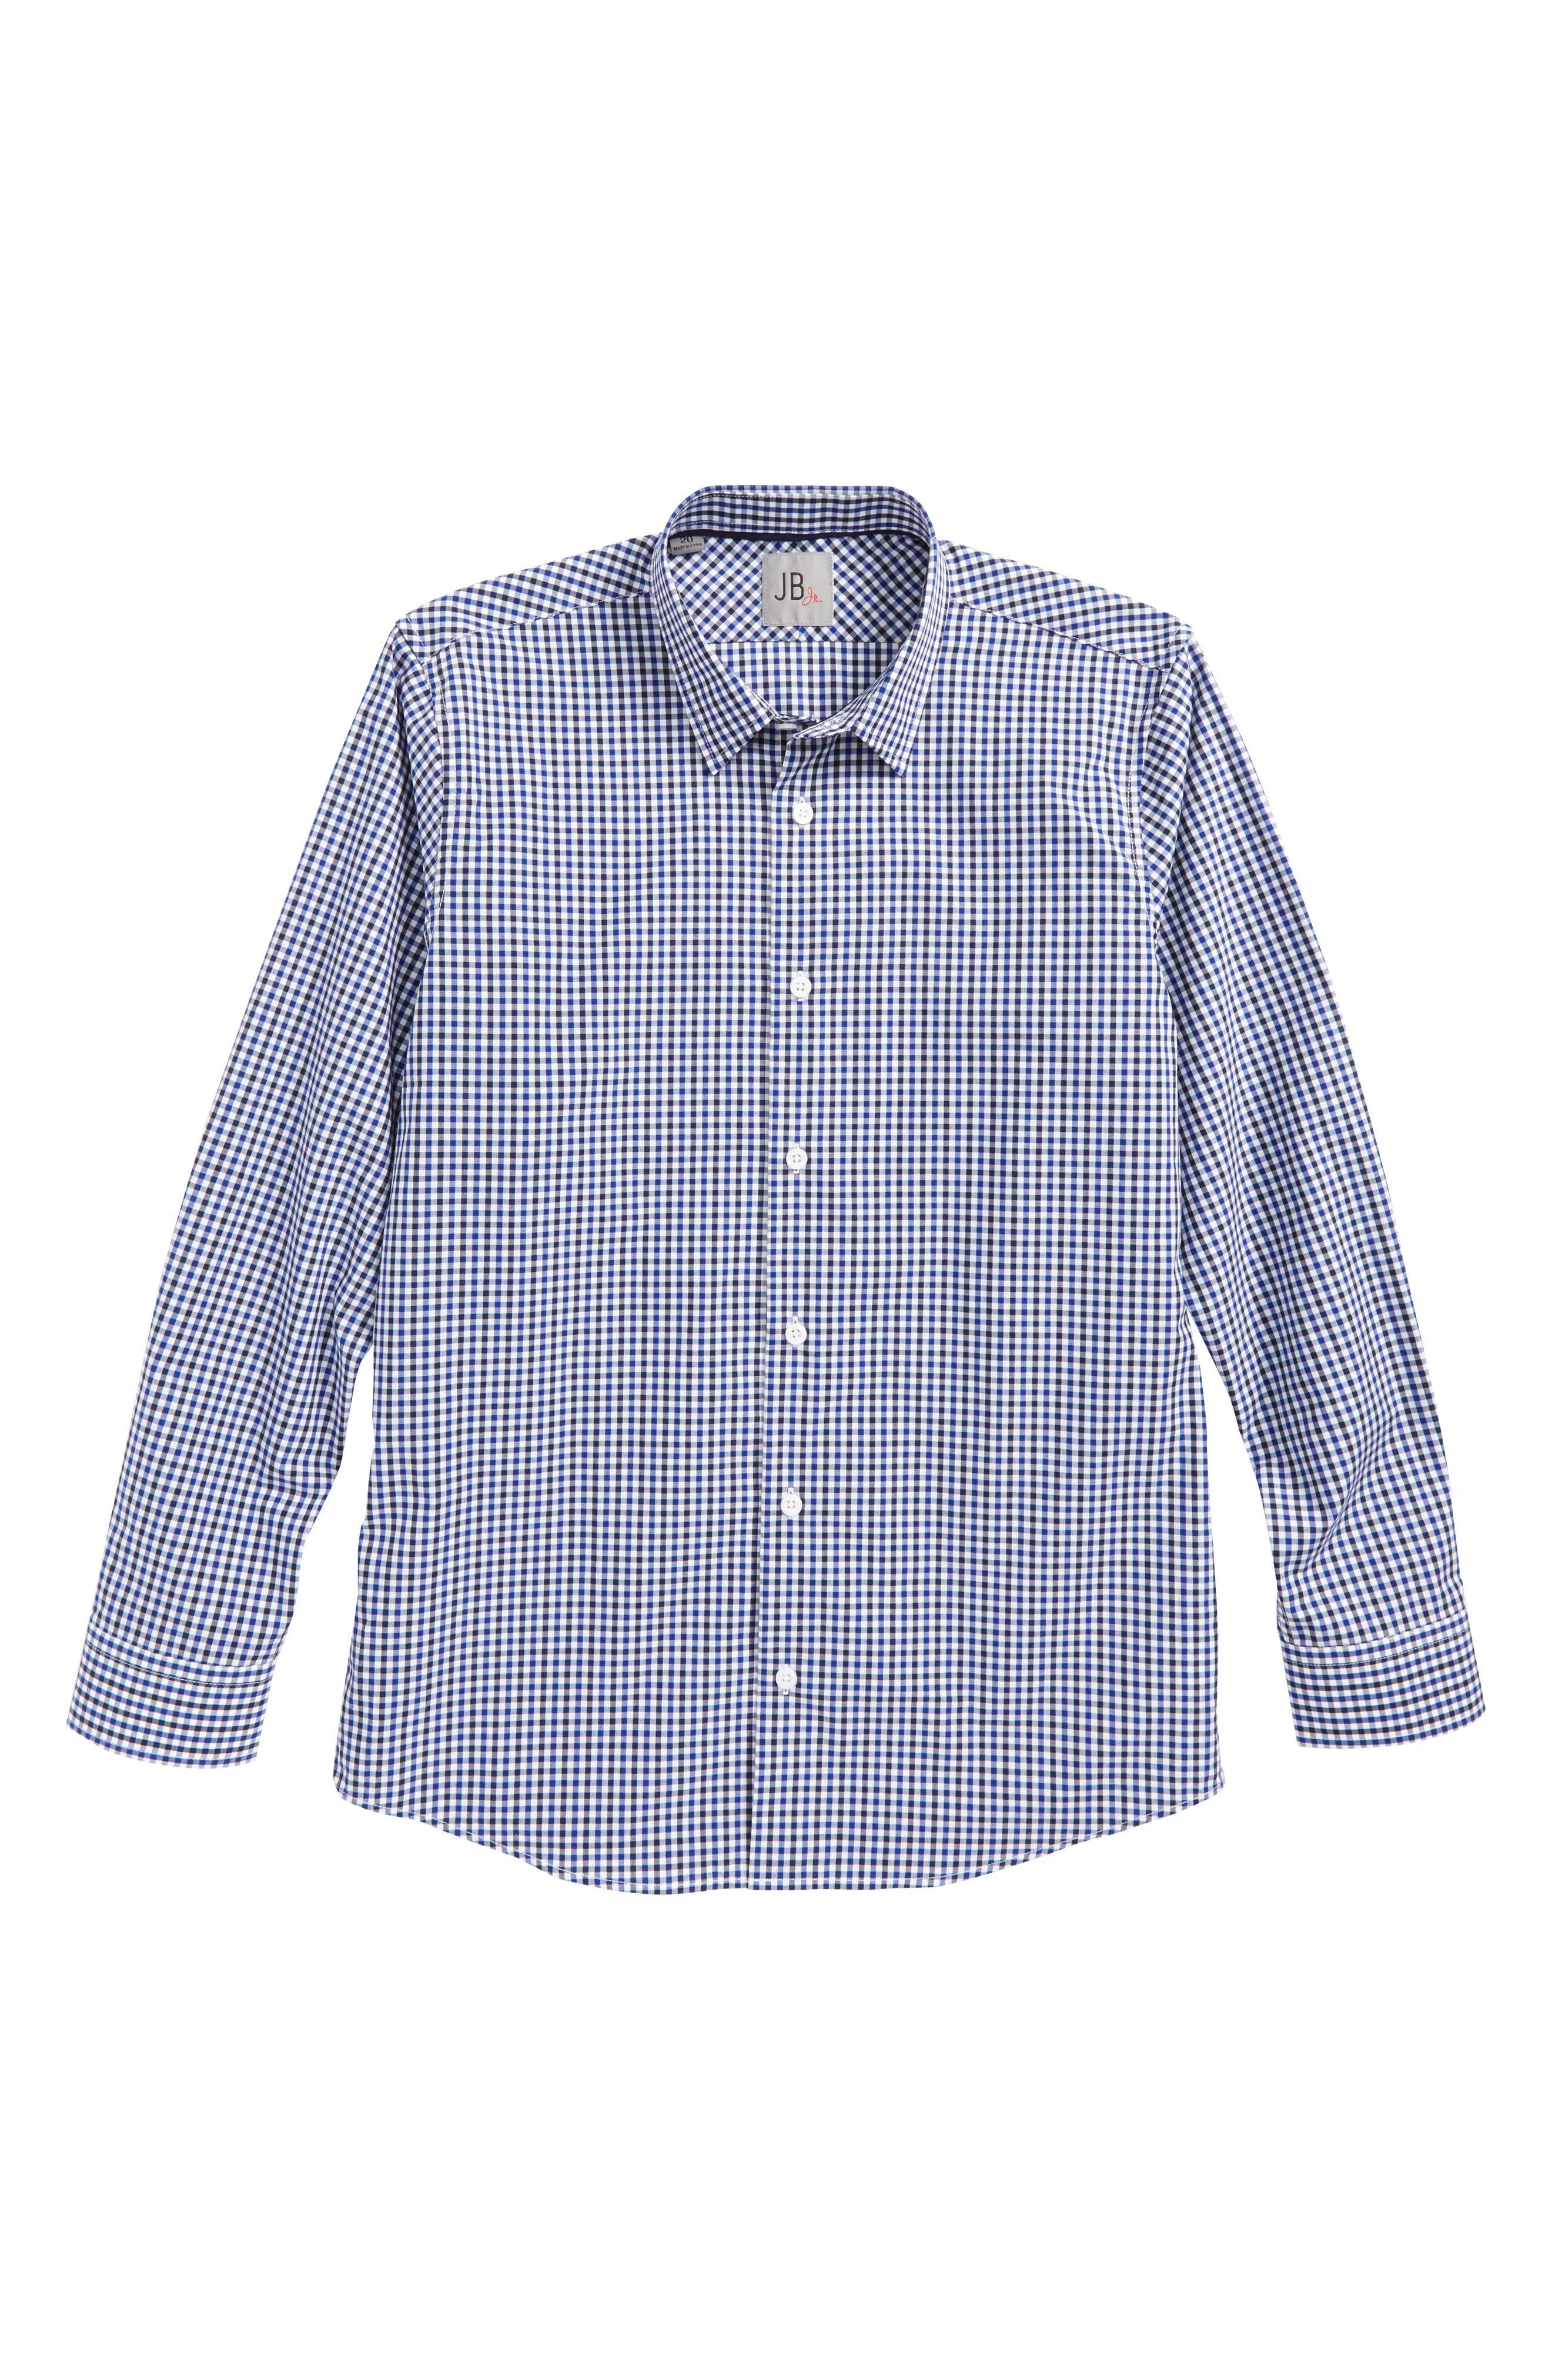 Neat Check Dress Shirt,                         Main,                         color,